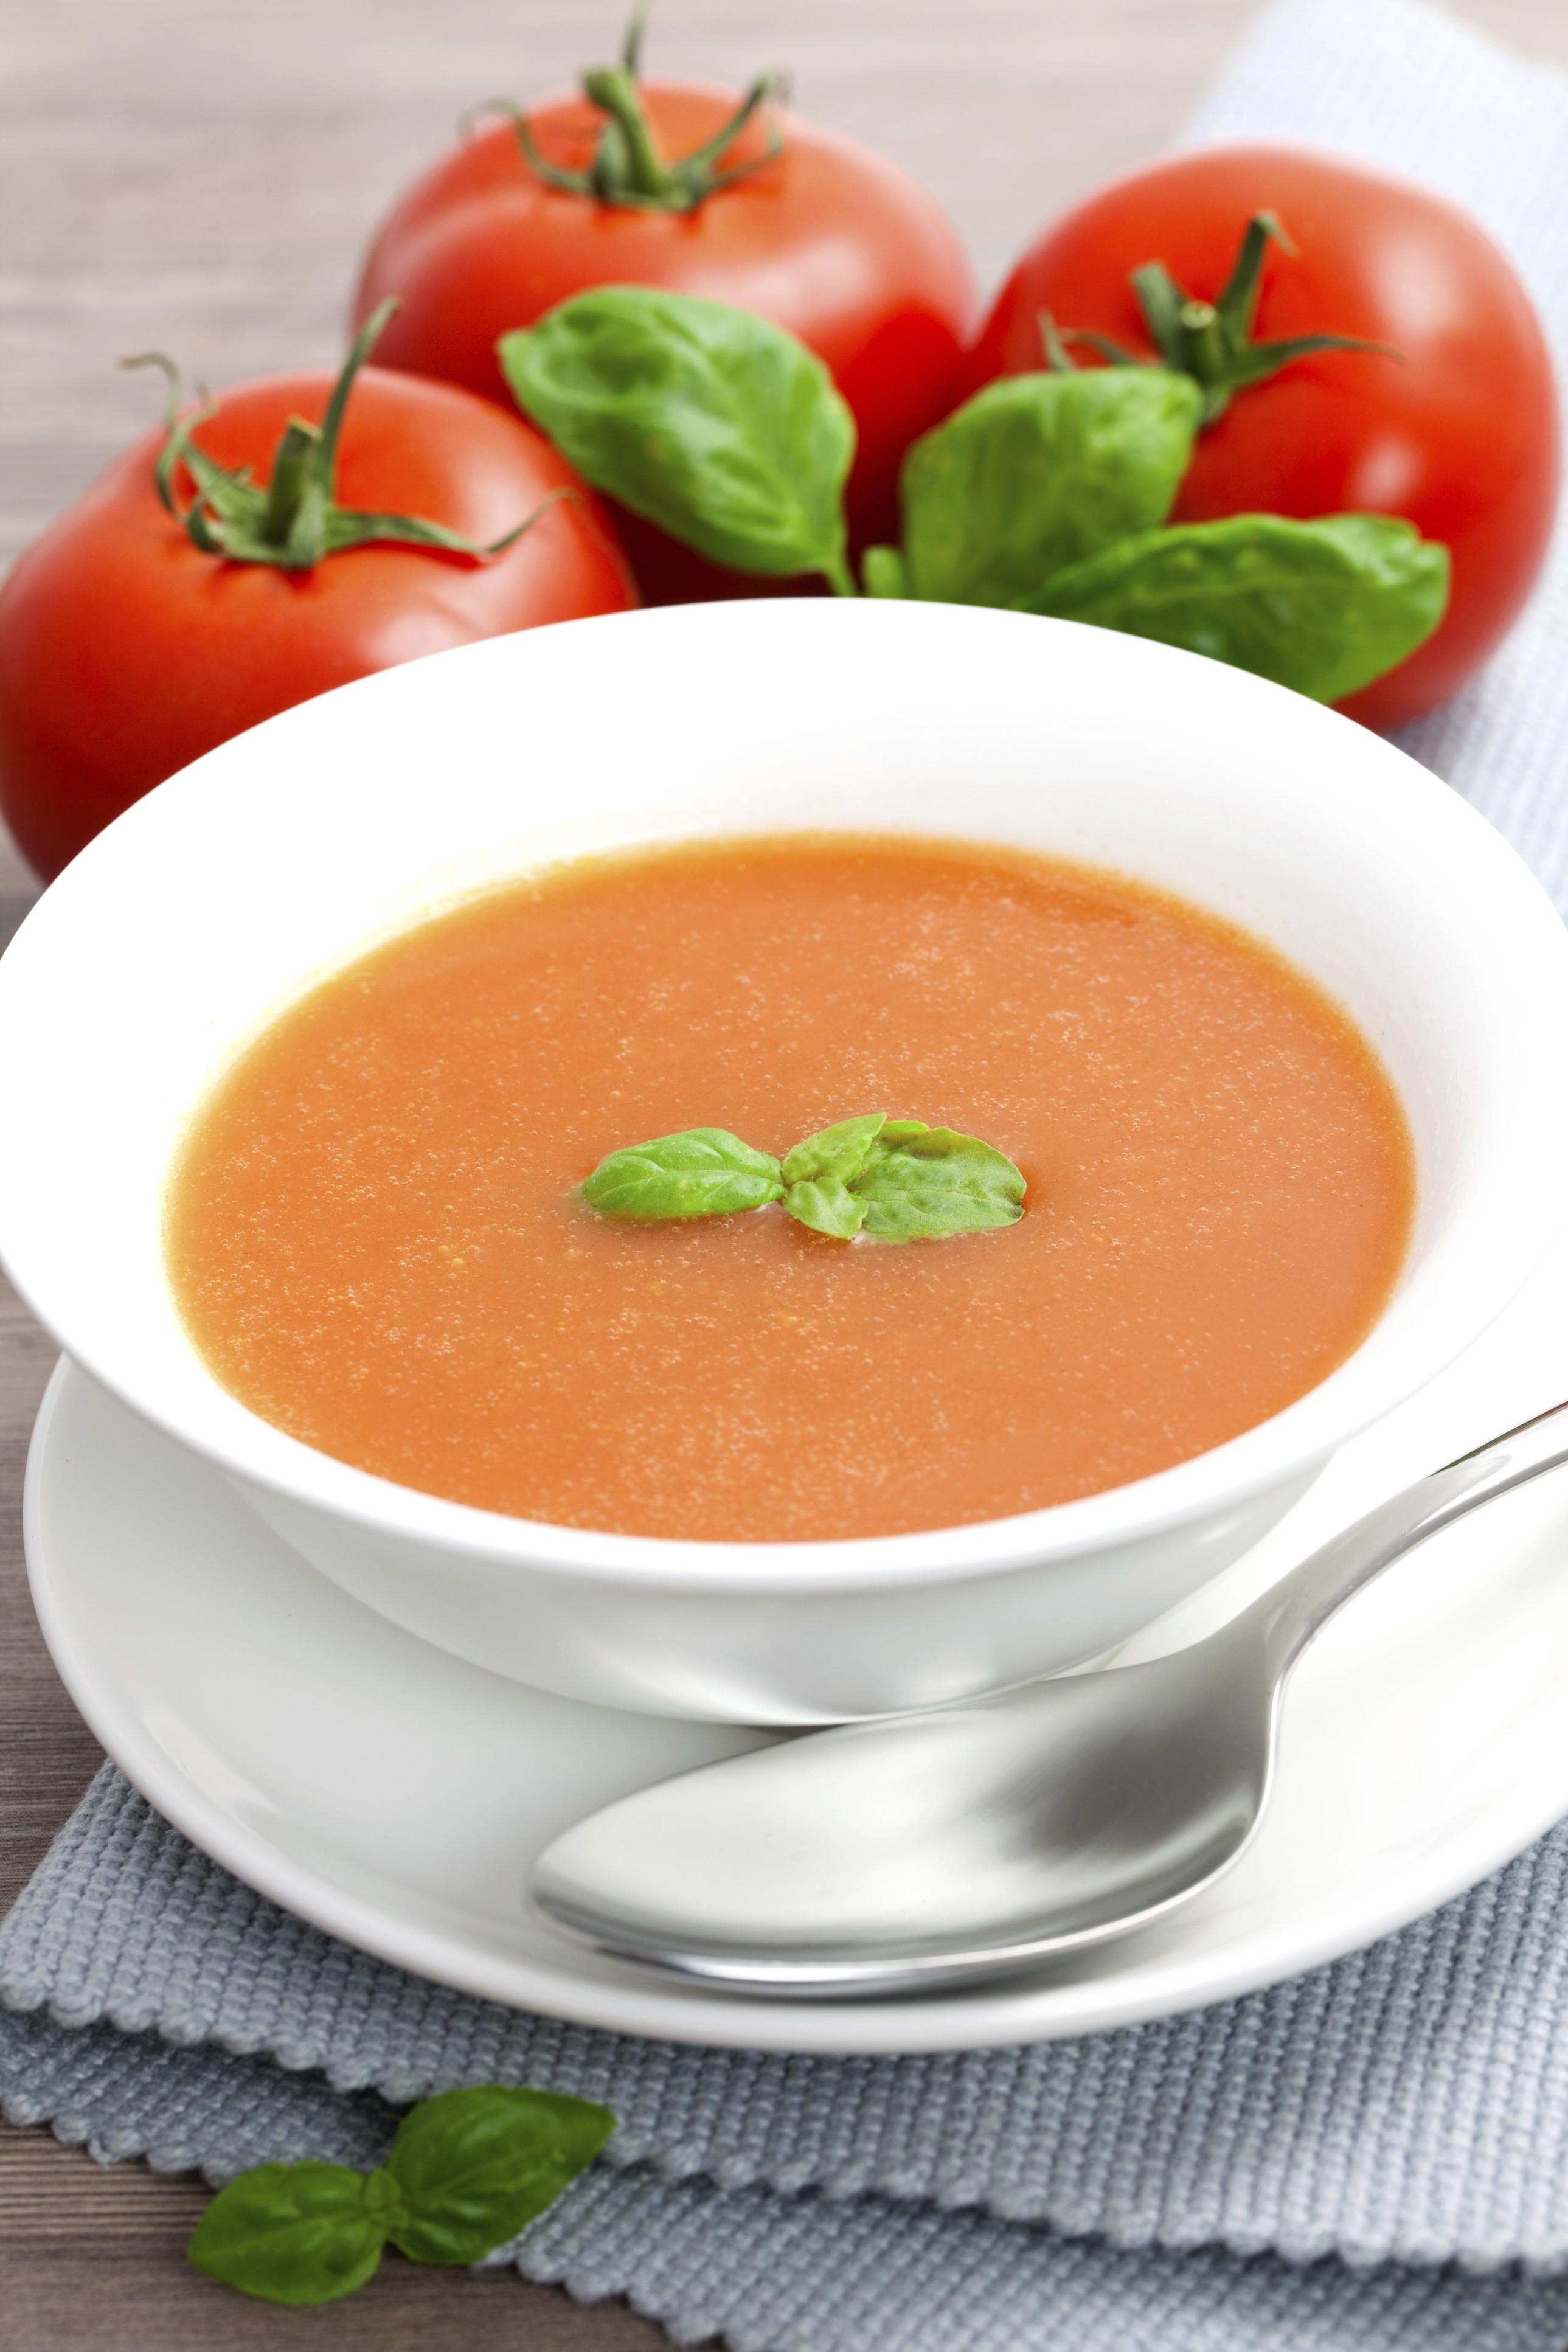 How To Make Tomato Soup  How To Make Tomato Soup Glorious Soup Recipes